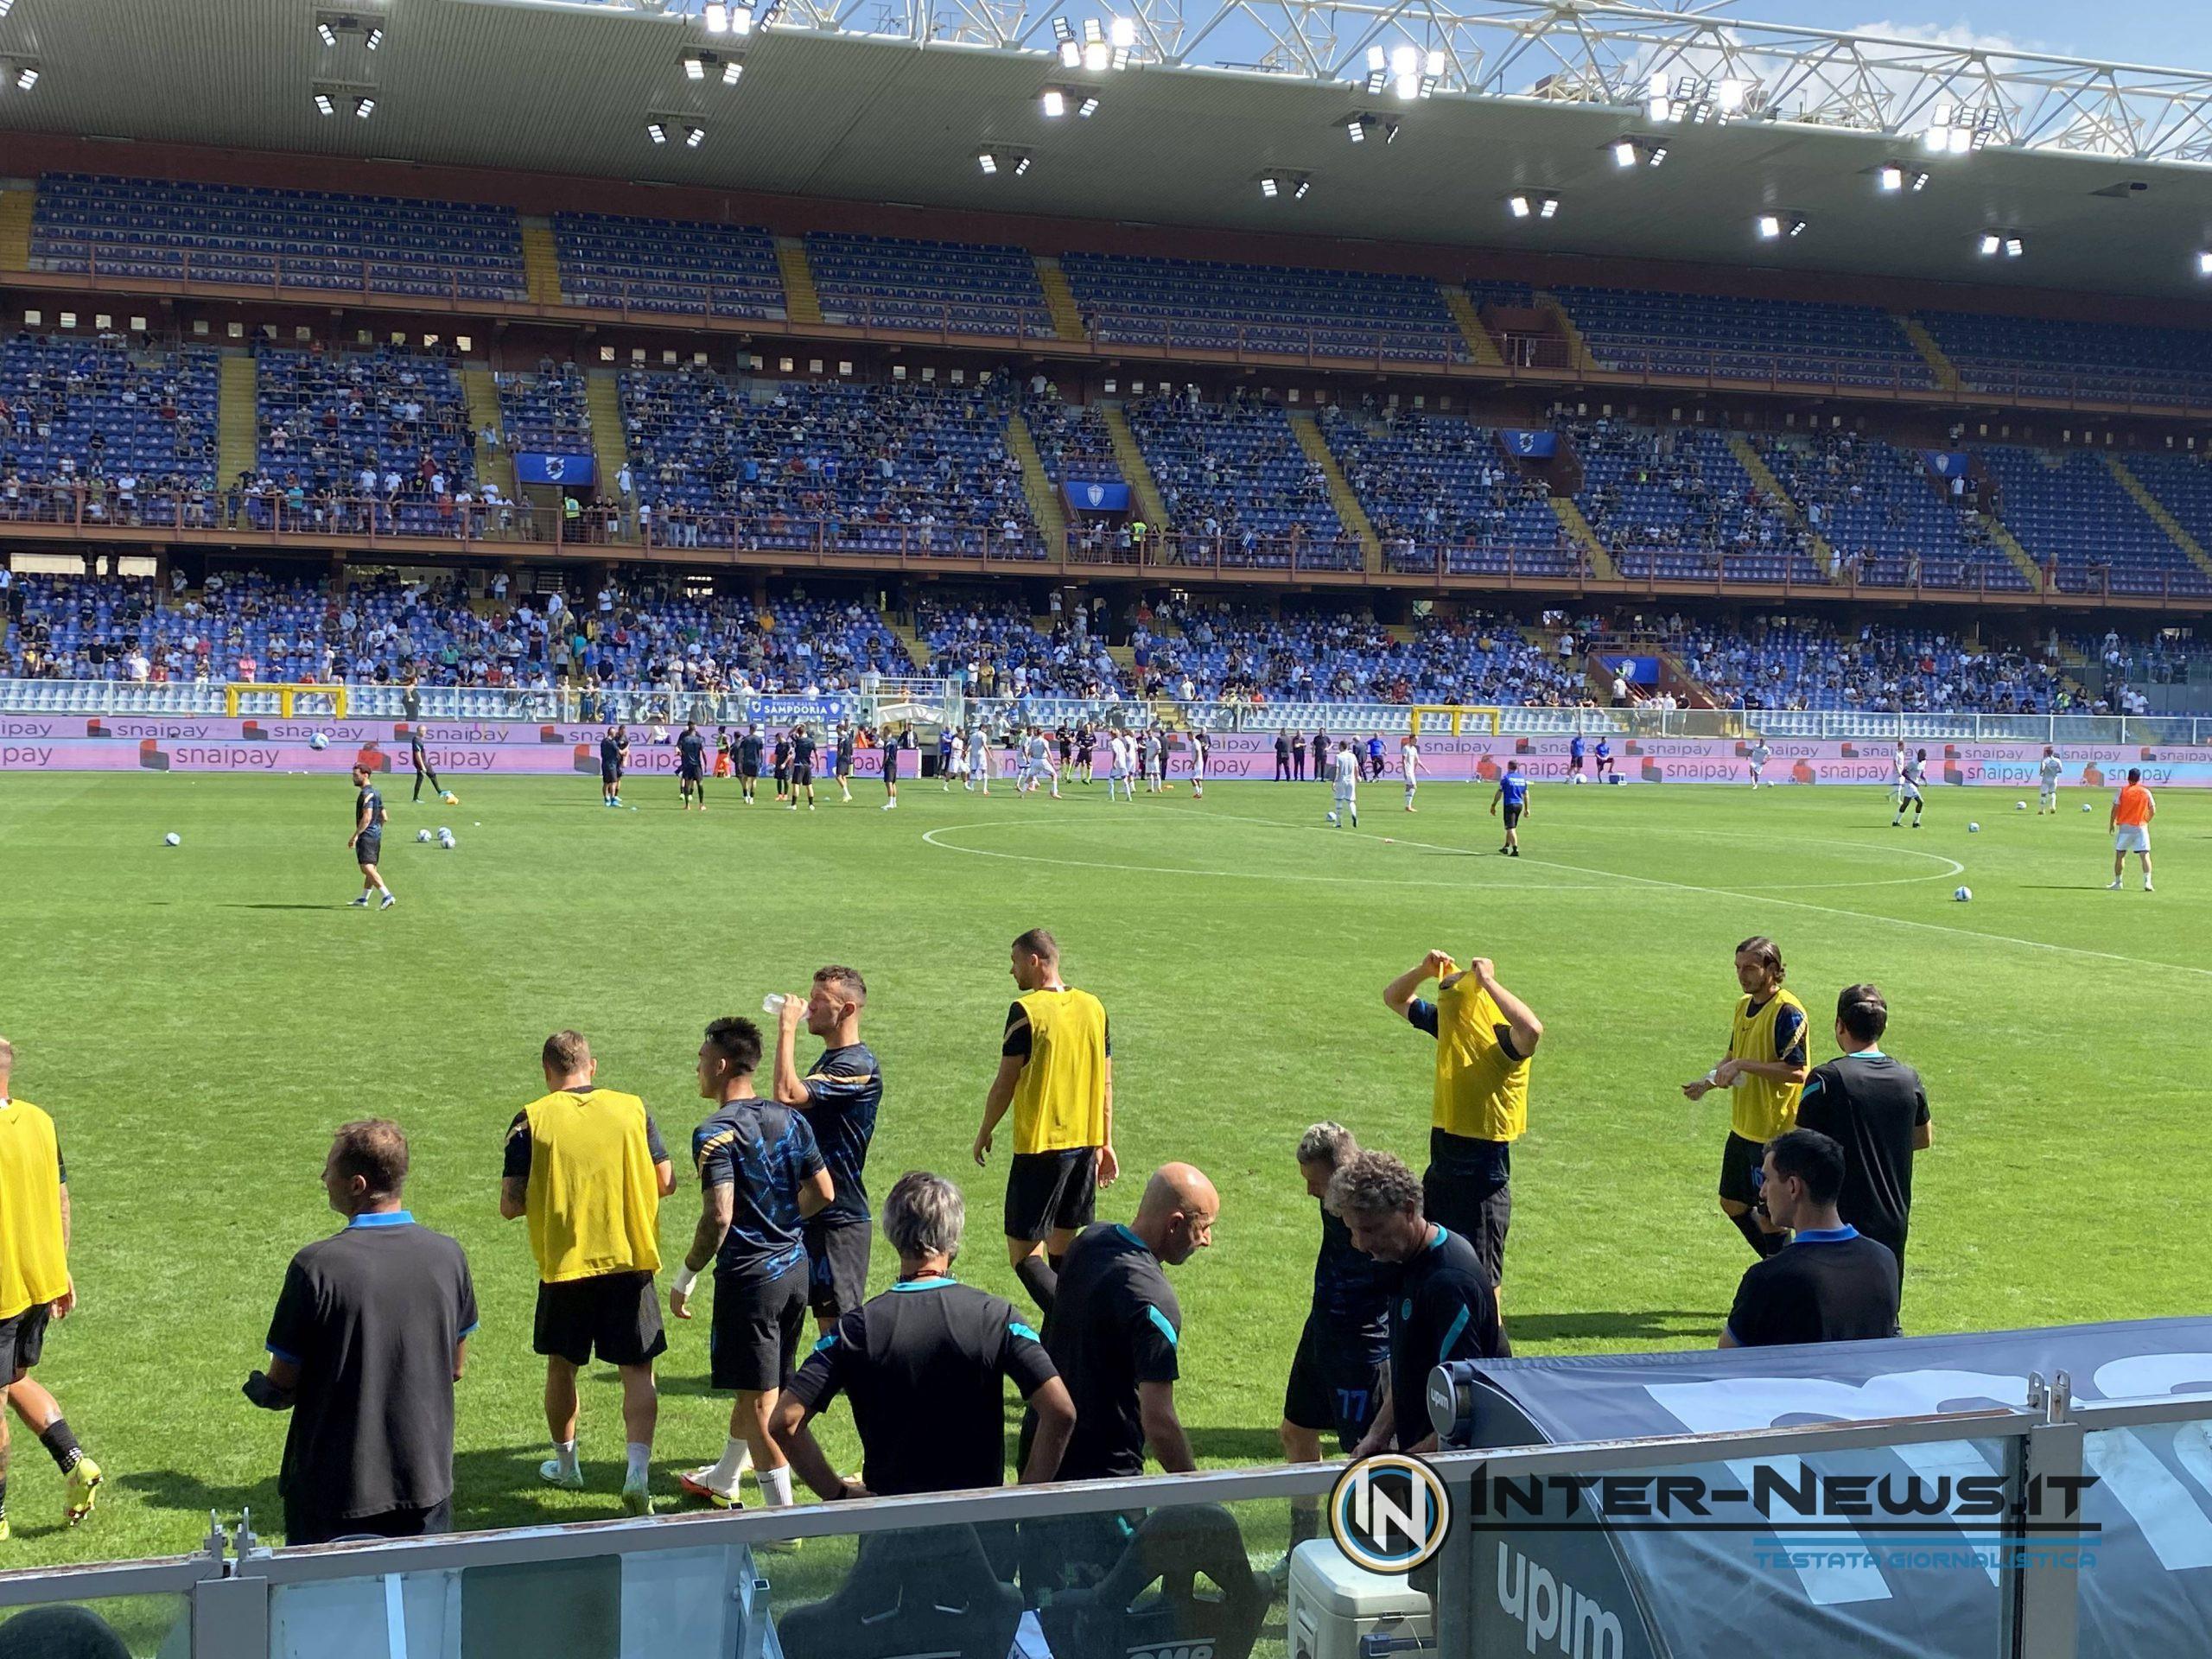 Sampdoria-Inter riscaldamento (photo by Roberto Balestracci, copyright Inter-News.it)